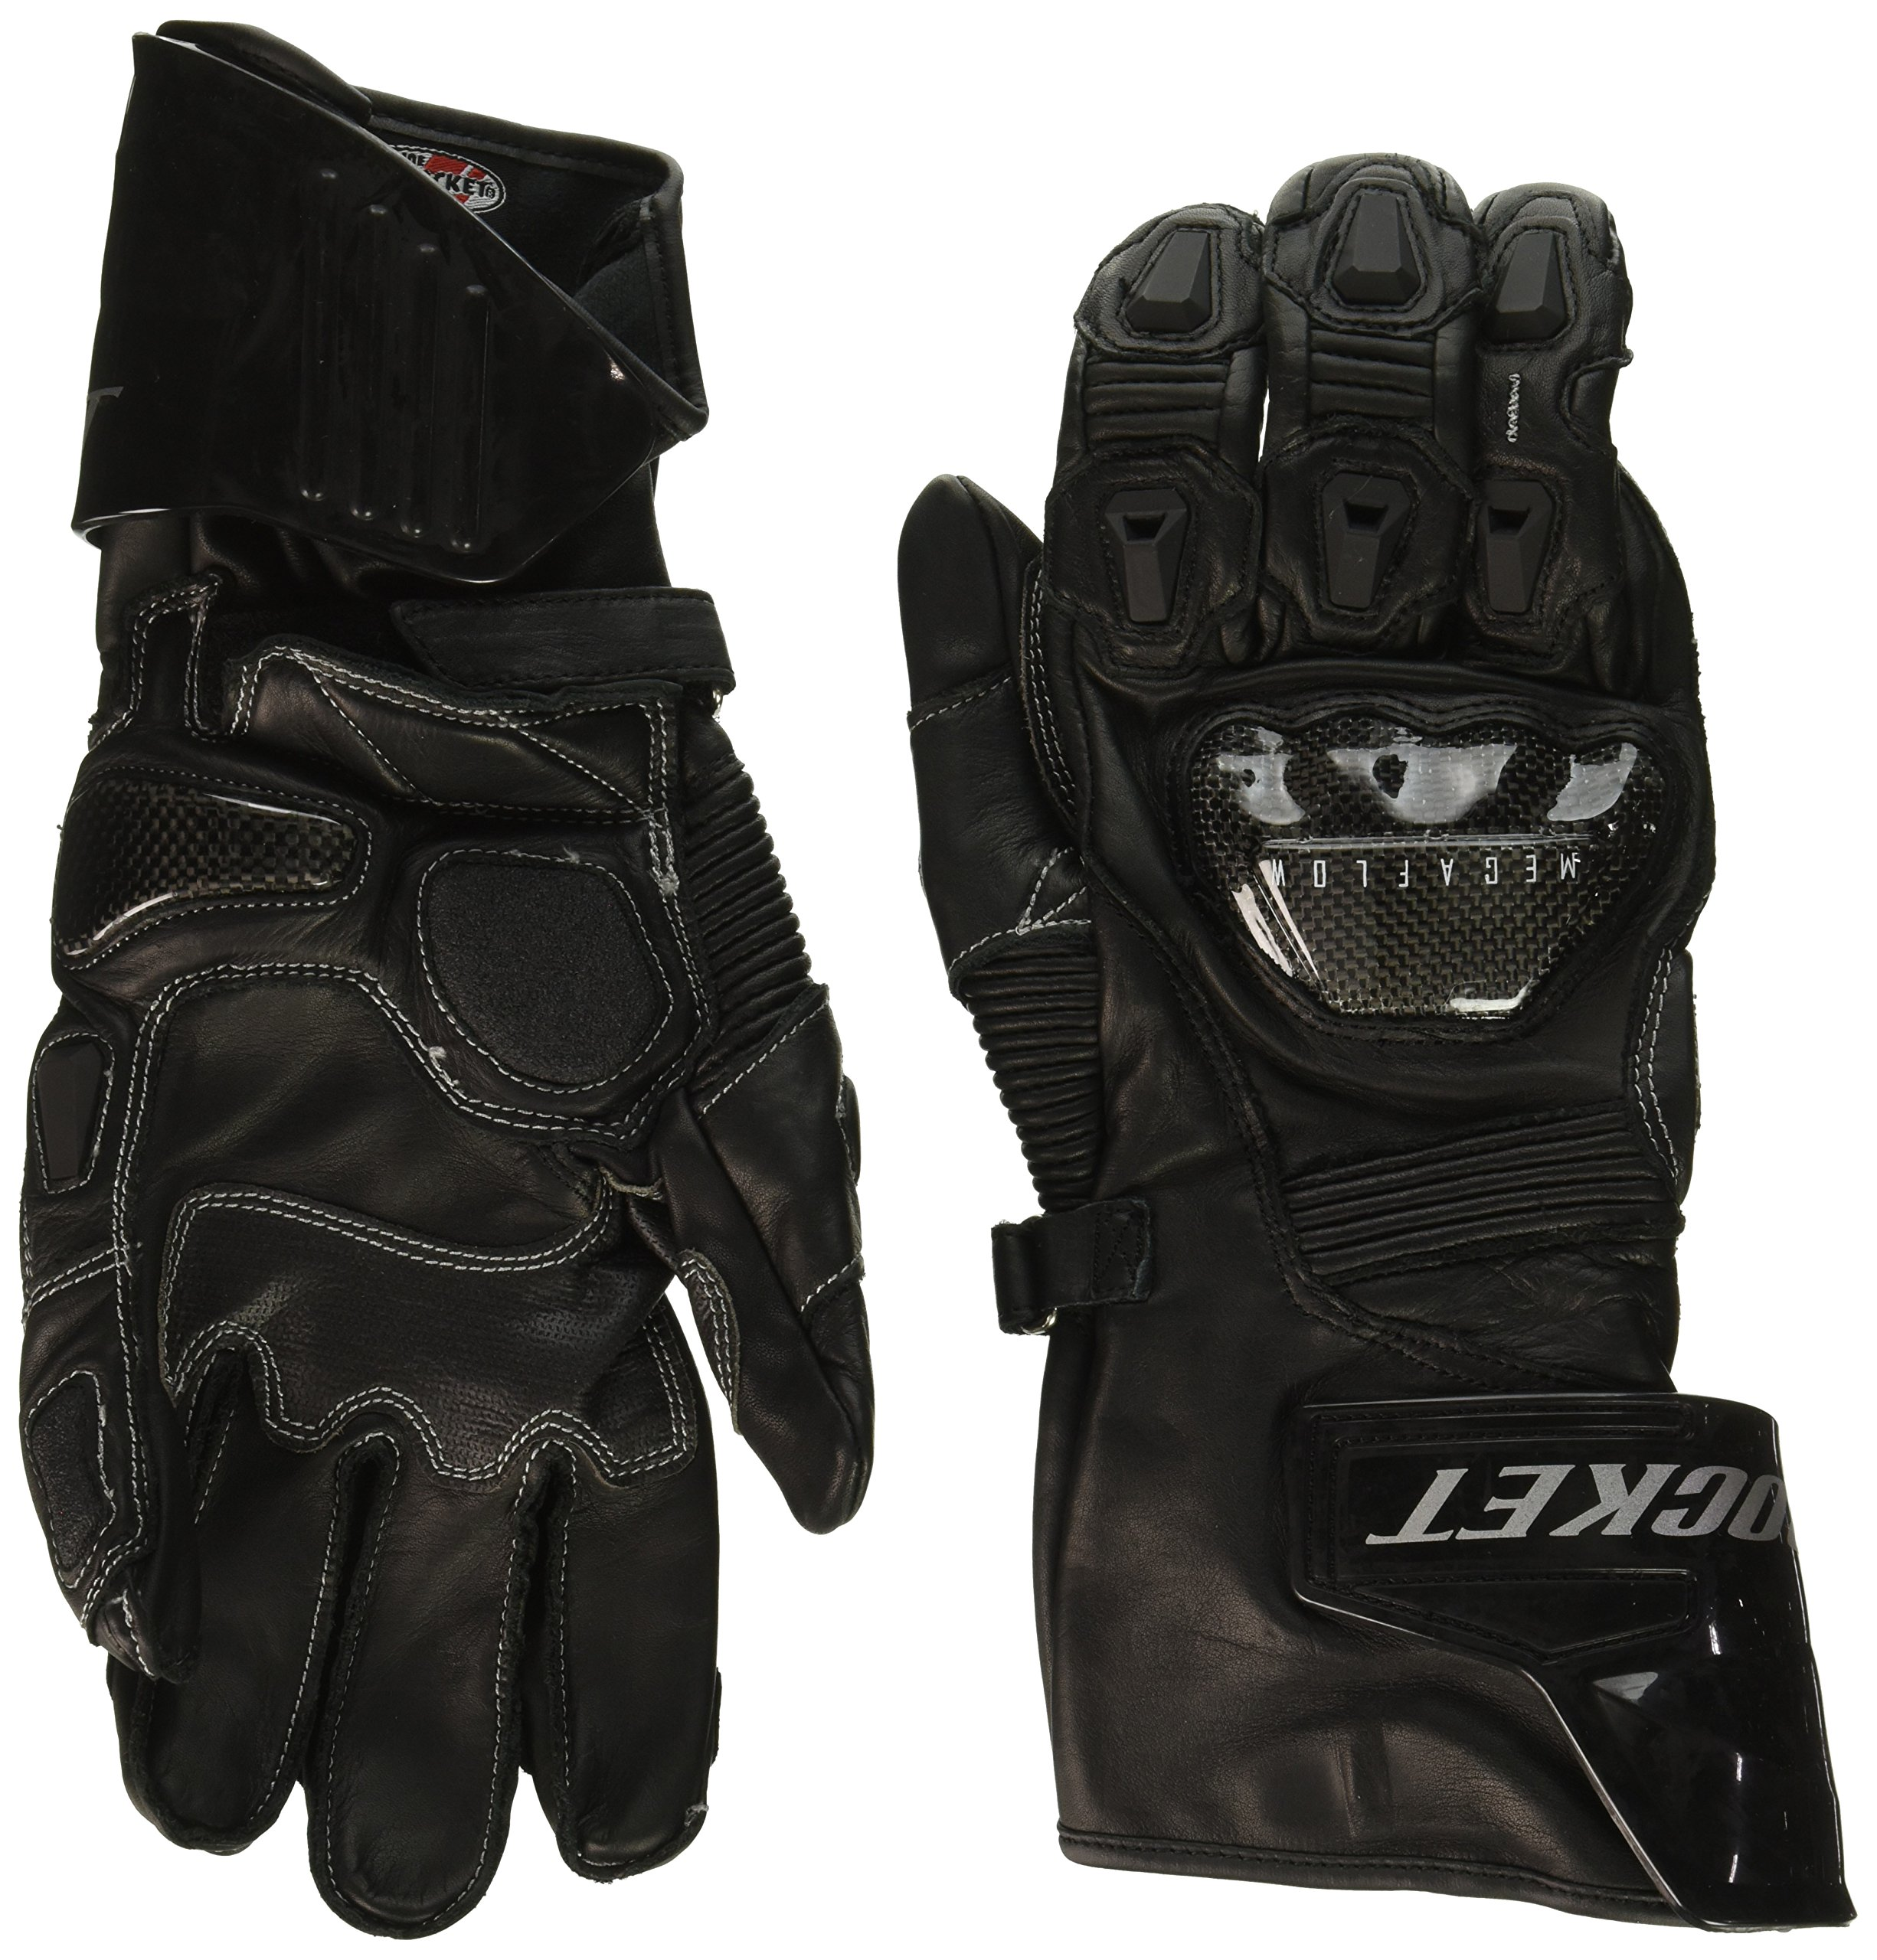 Joe Rocket Men's GPX Motorcycle Gloves (Black/Black, X-Large) by Joe Rocket (Image #1)